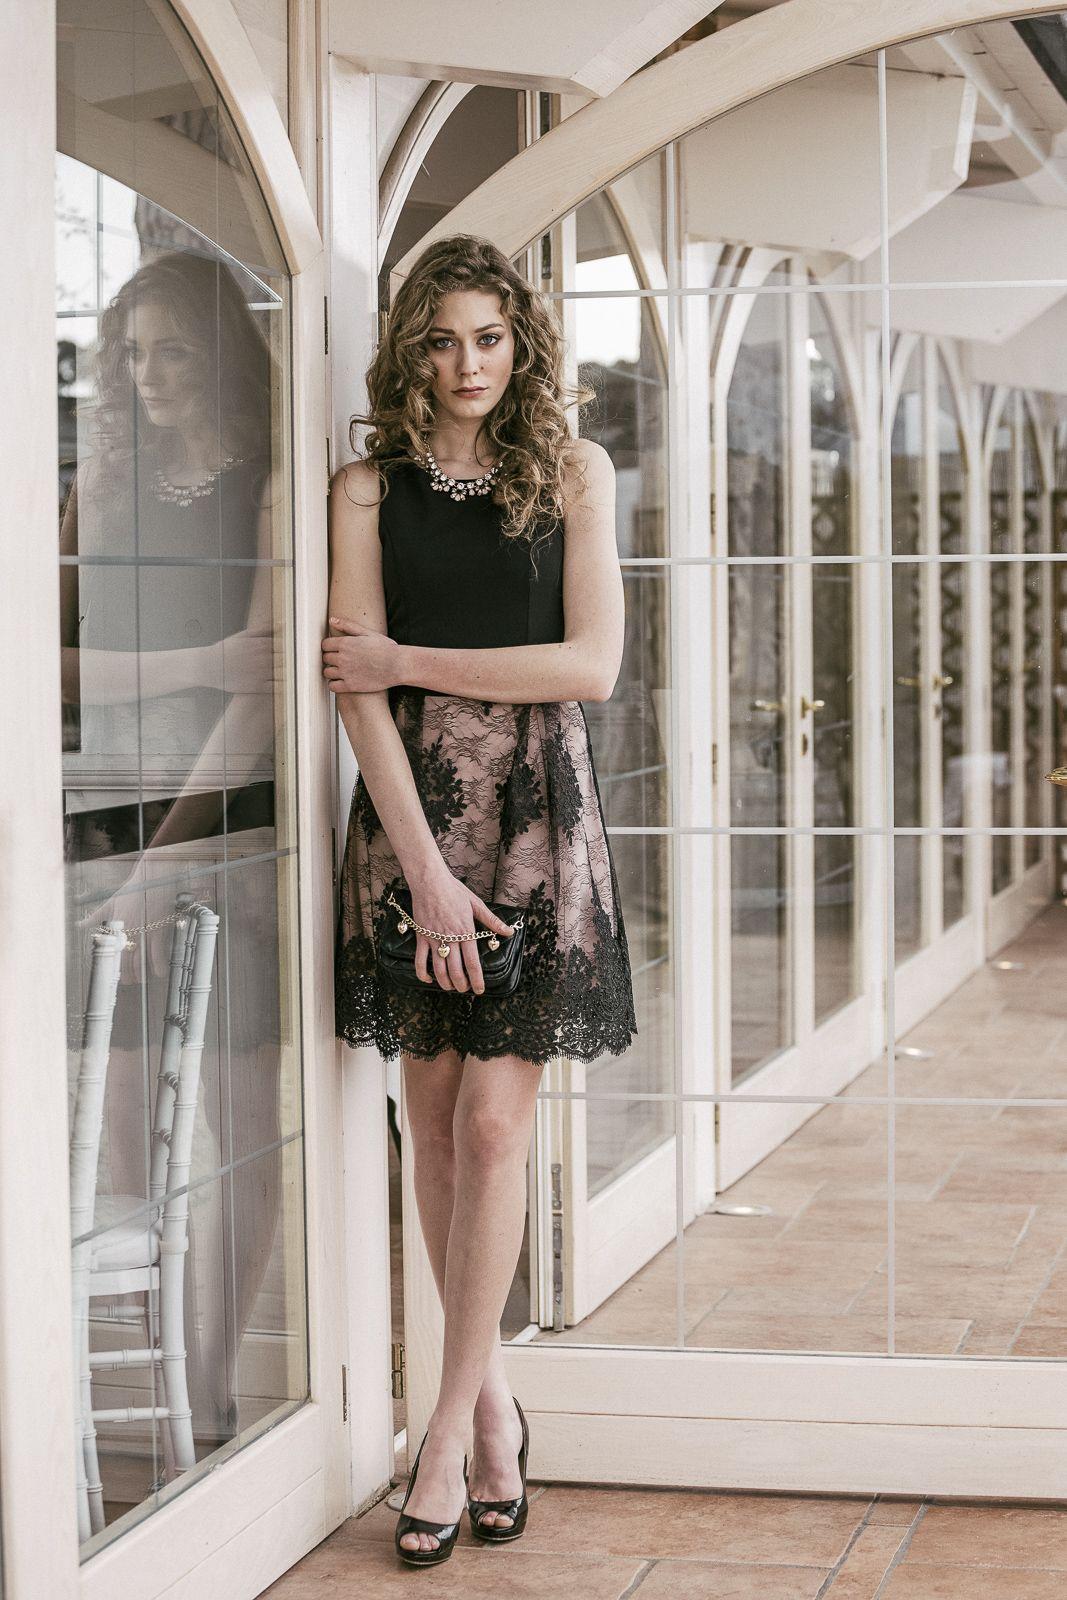 Abiti Eleganti Nuna Lie.Black And Pink Lace Dress Fashion Spring 2016 Nuna Lie